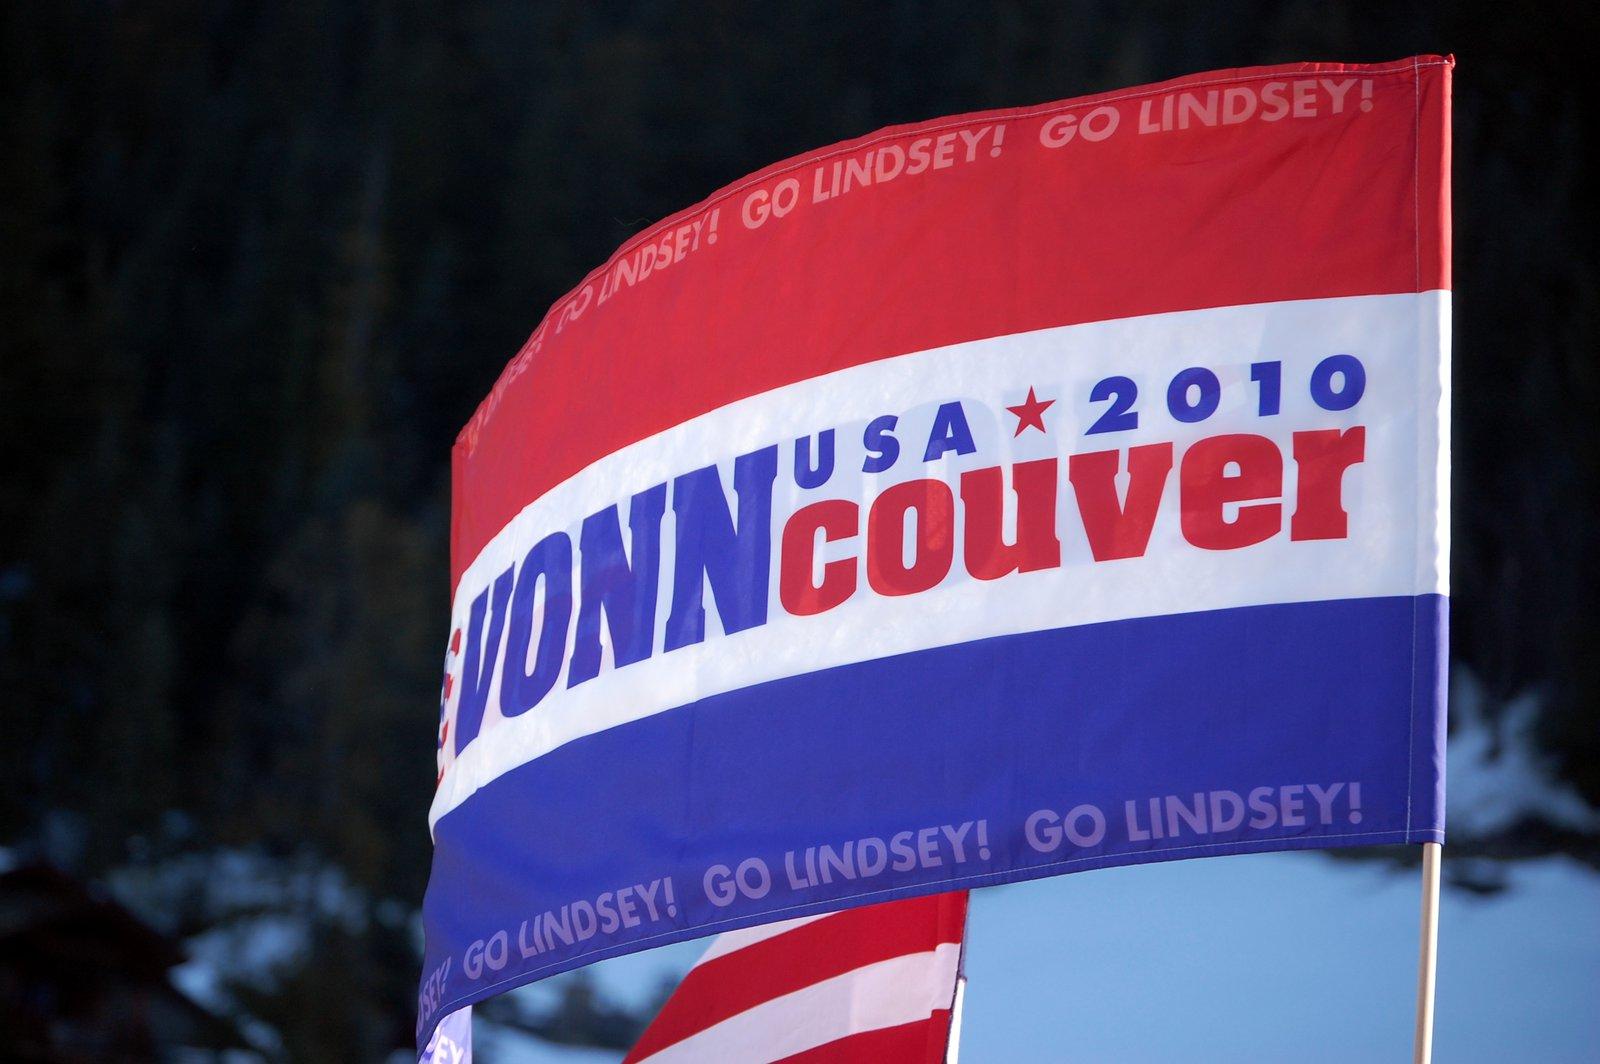 VONNcouver flag